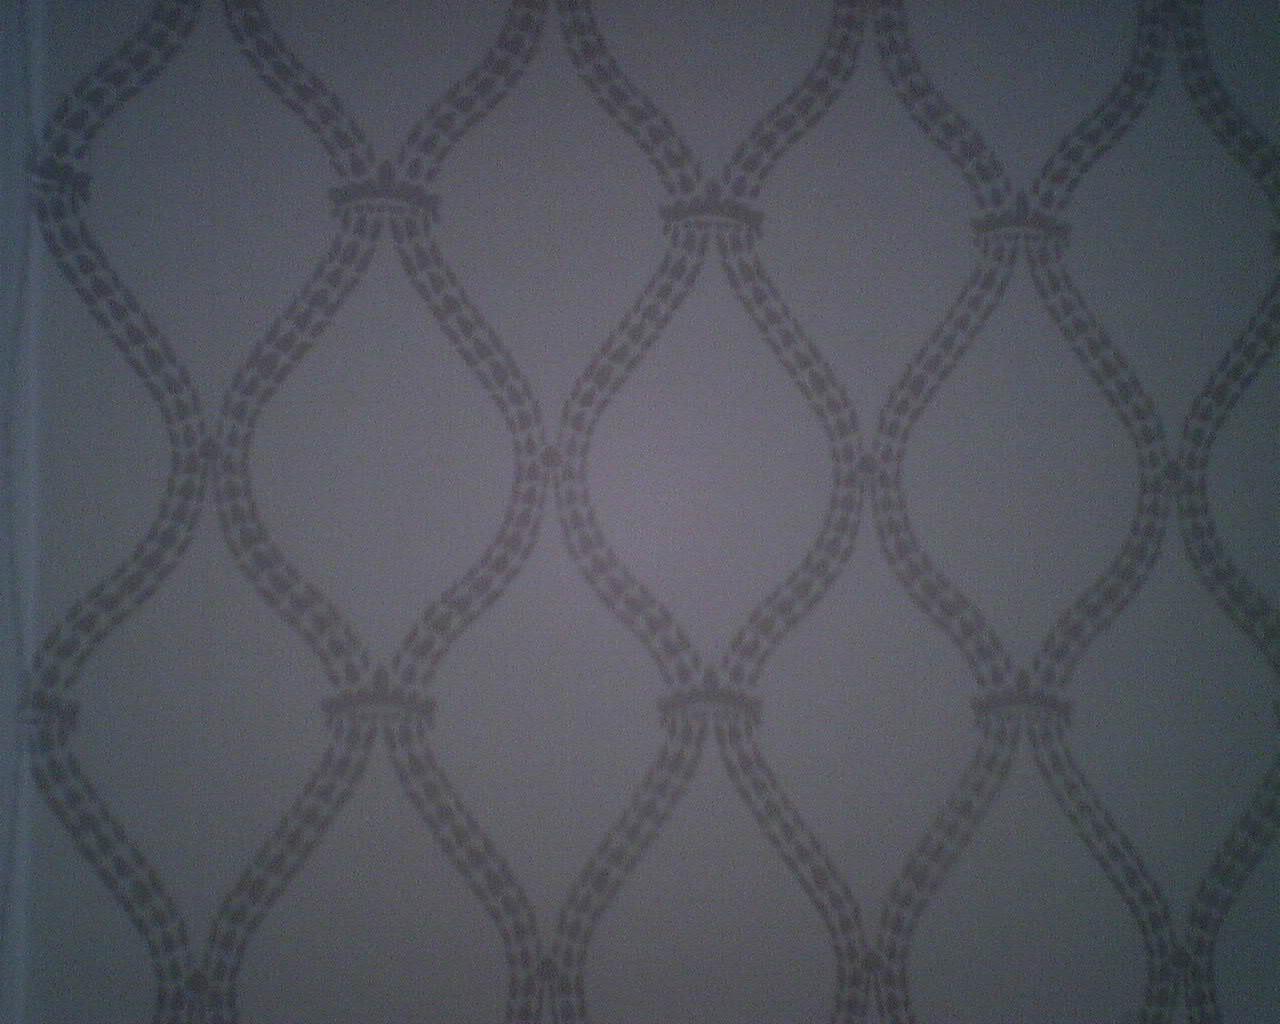 Most Inspiring Wallpaper Home Screen Marble - dsc000217  Best Photo Reference_983911.jpg